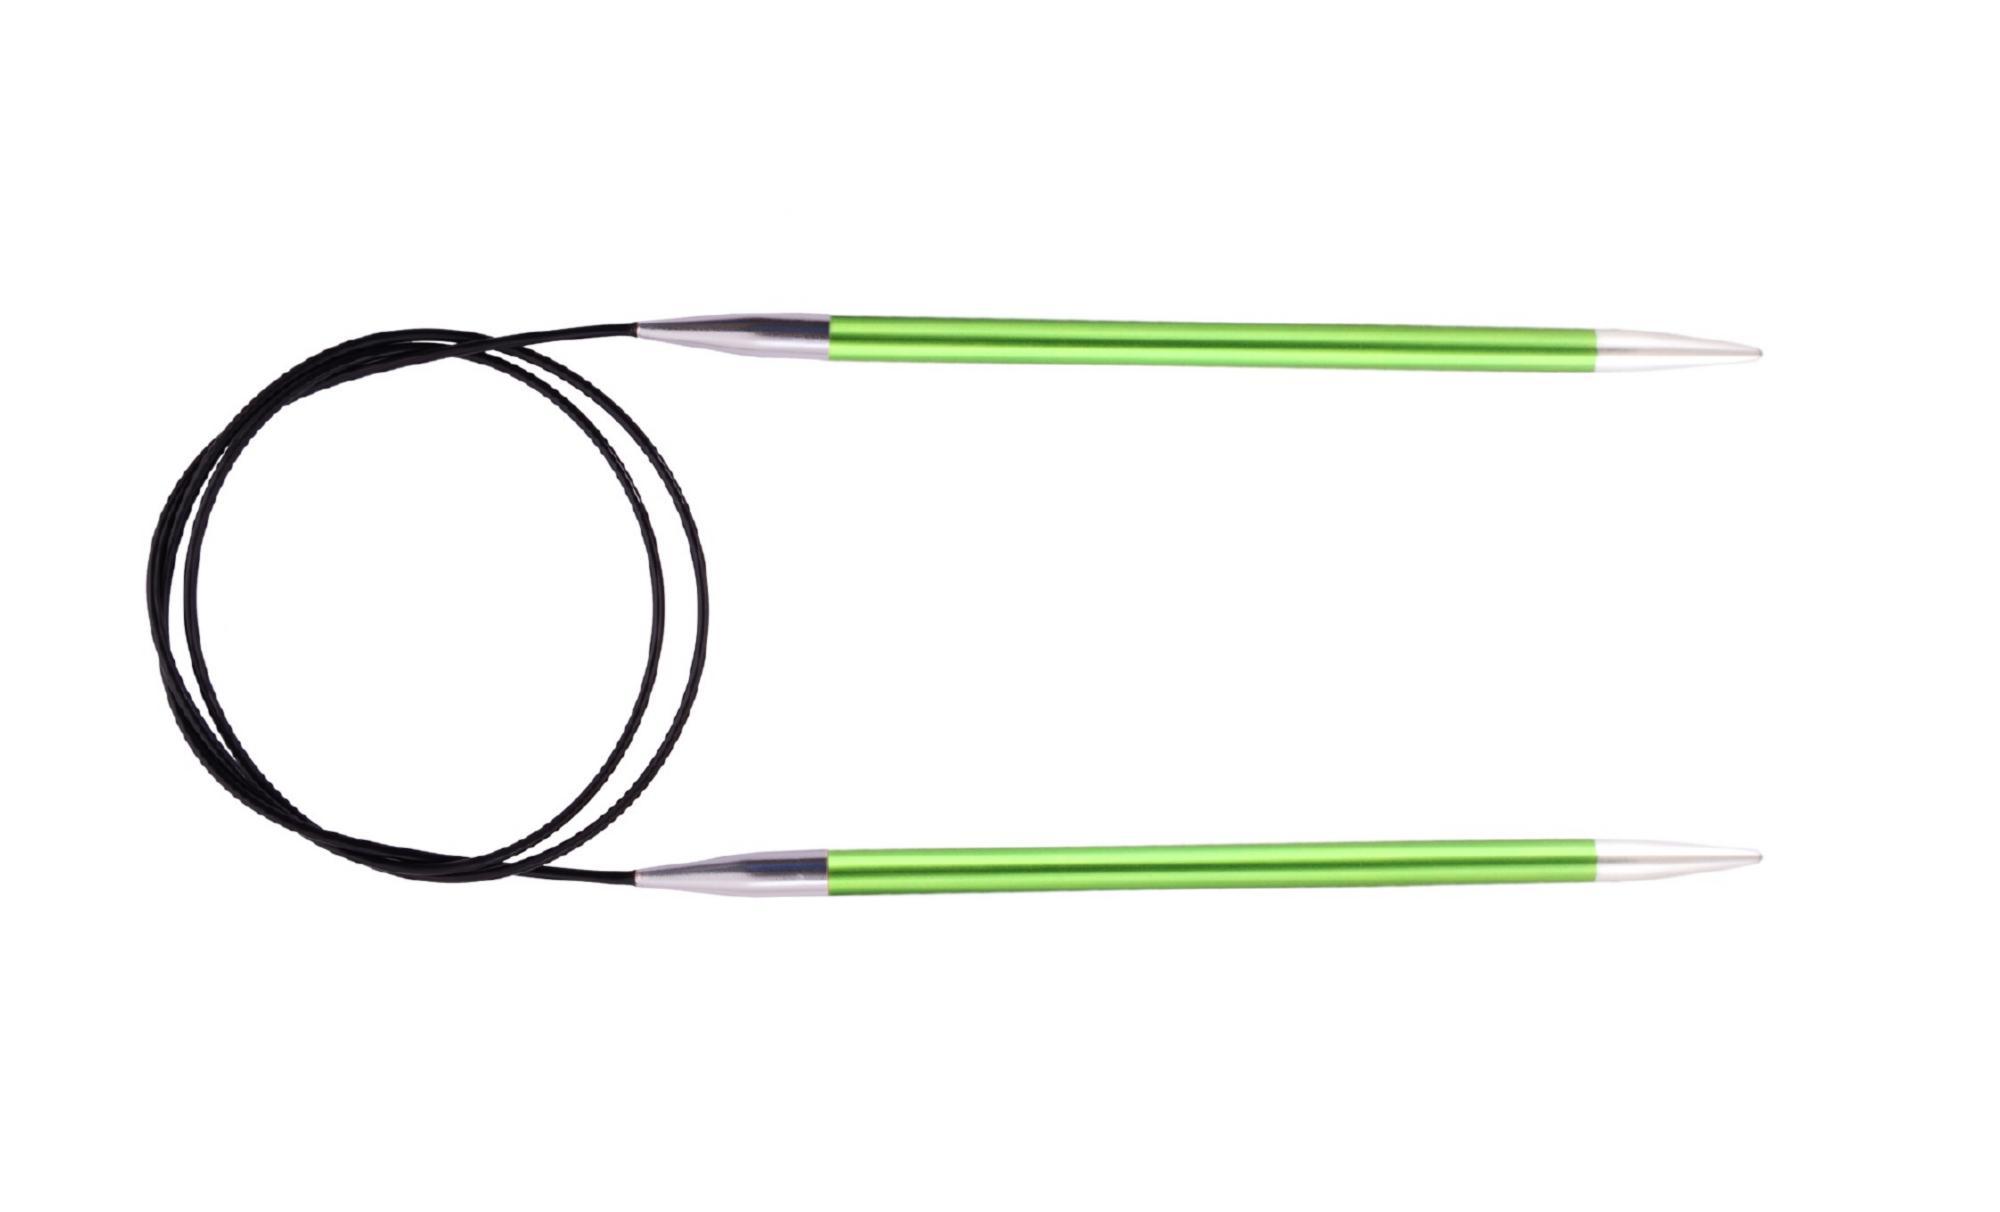 Спицы круговые 60 см Zing KnitPro, 47097, 3.50 мм